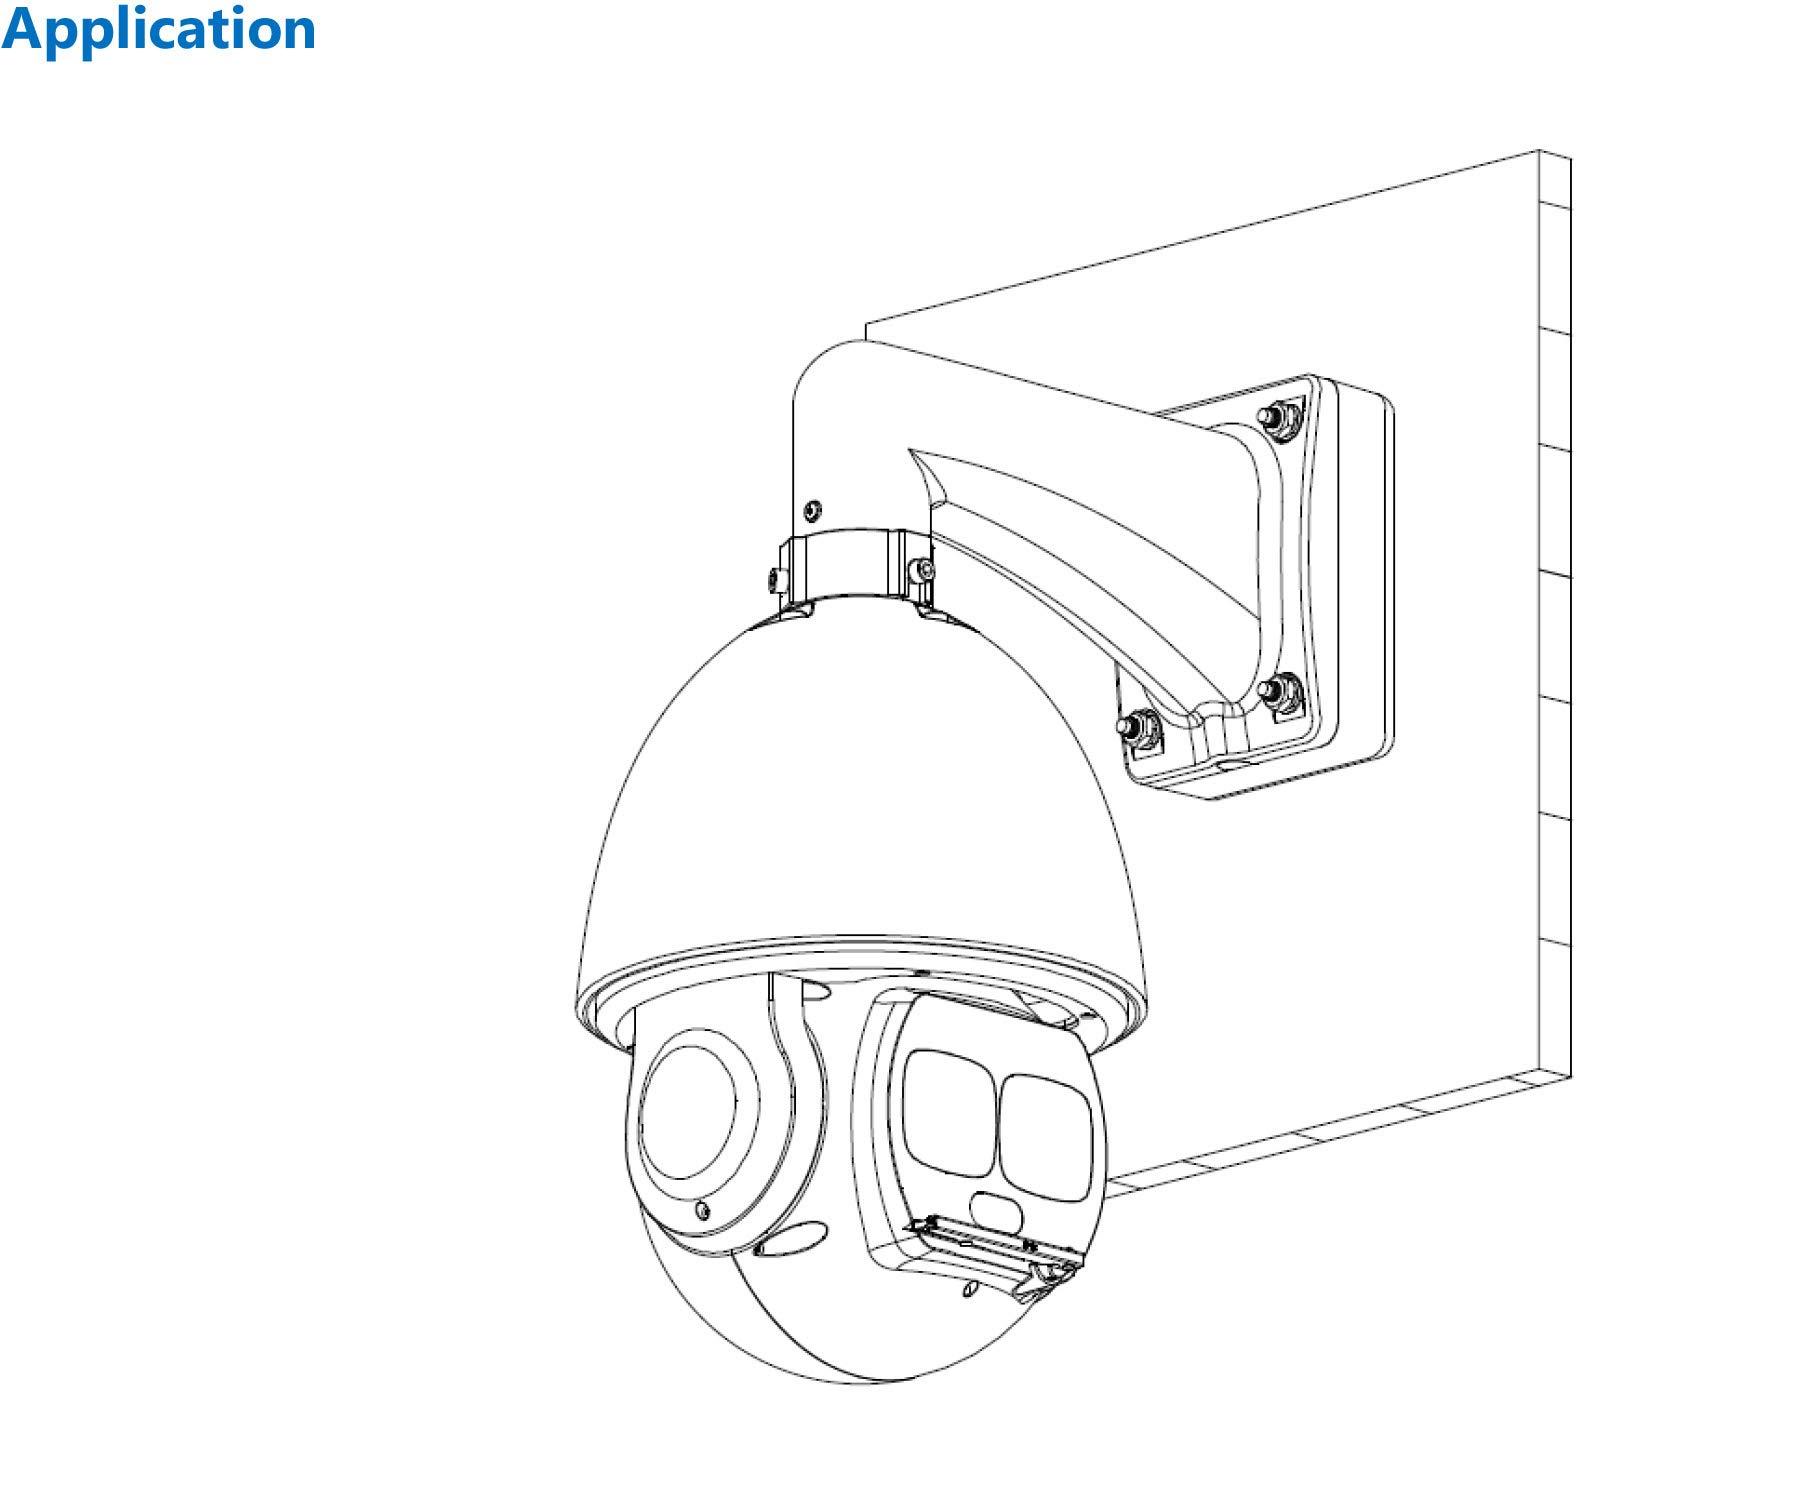 Dahua PFA120 Aluminum Waterproof Junction Box for Dome Cameras by DAHUA Junction Box PFA120 Match with PFB300S, PFB303W, PFA140